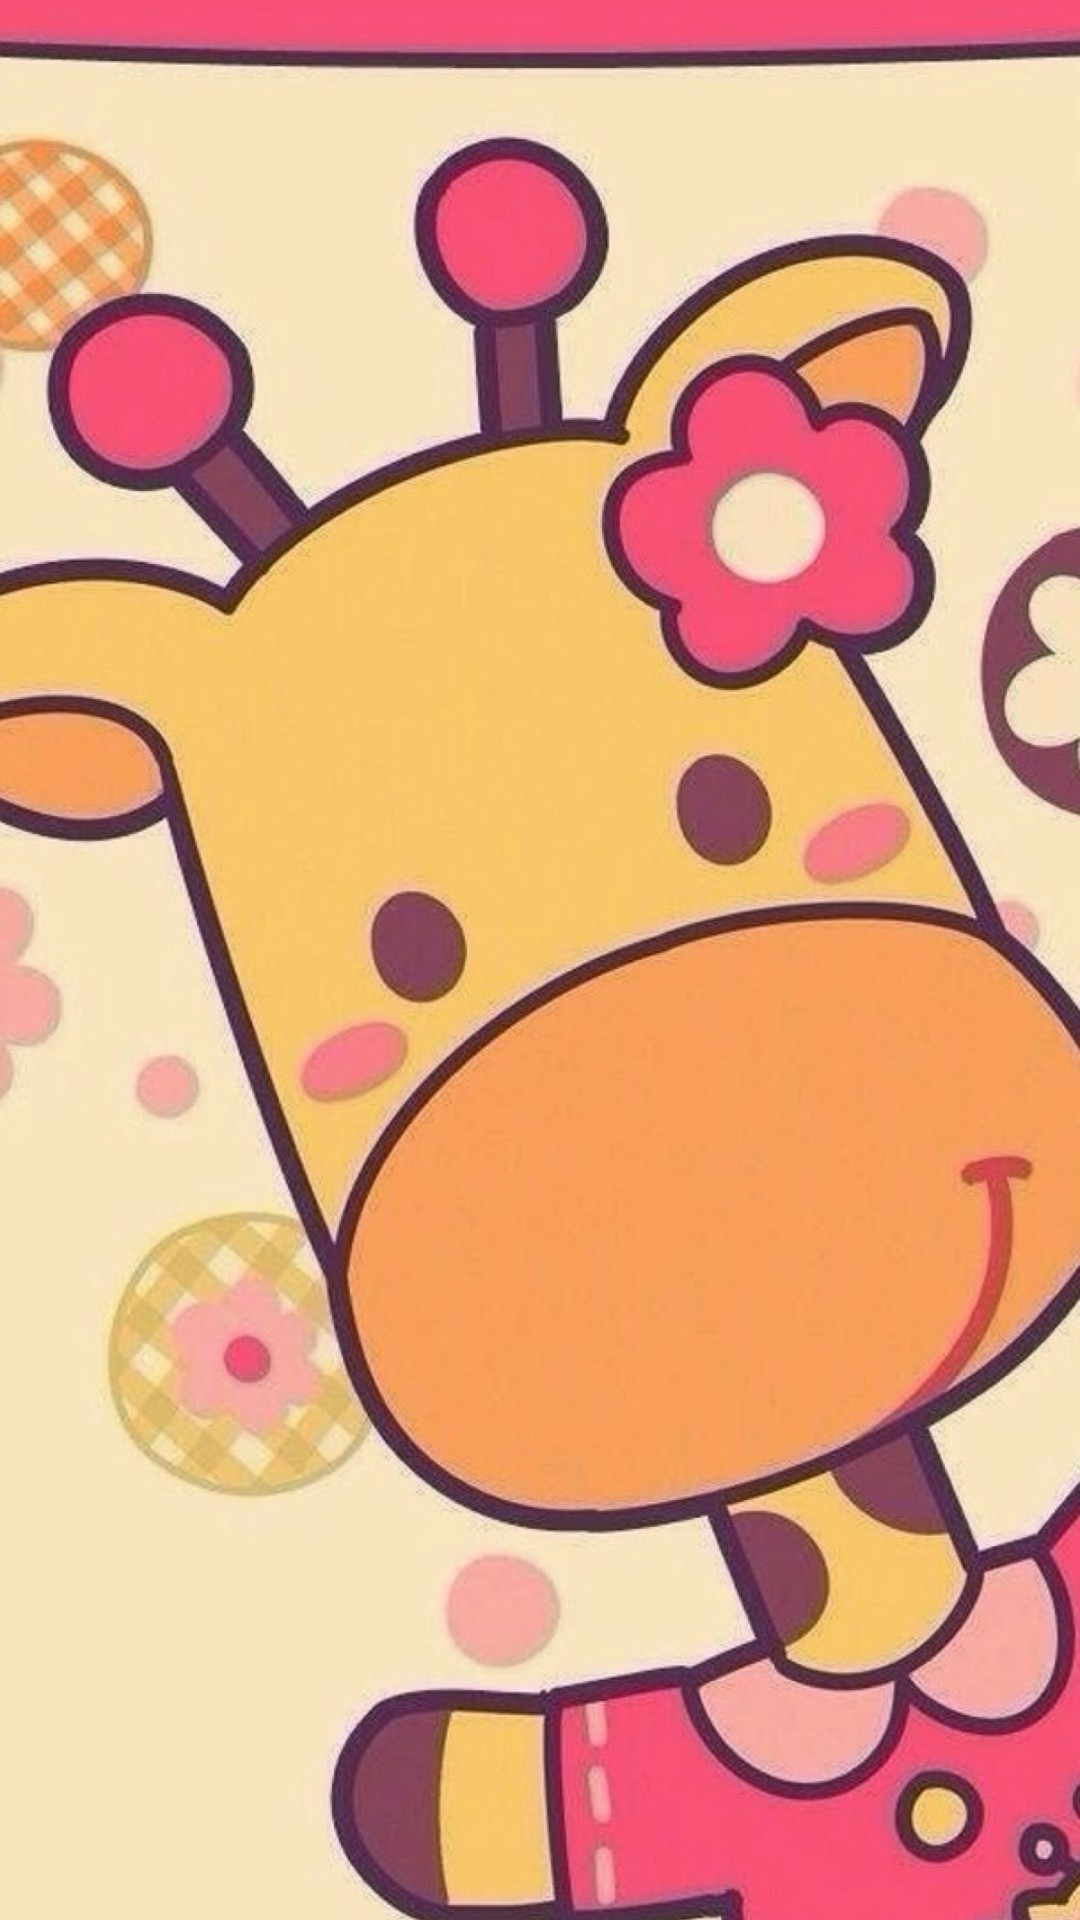 Cute giraffe iphone wallpaper – photo#9